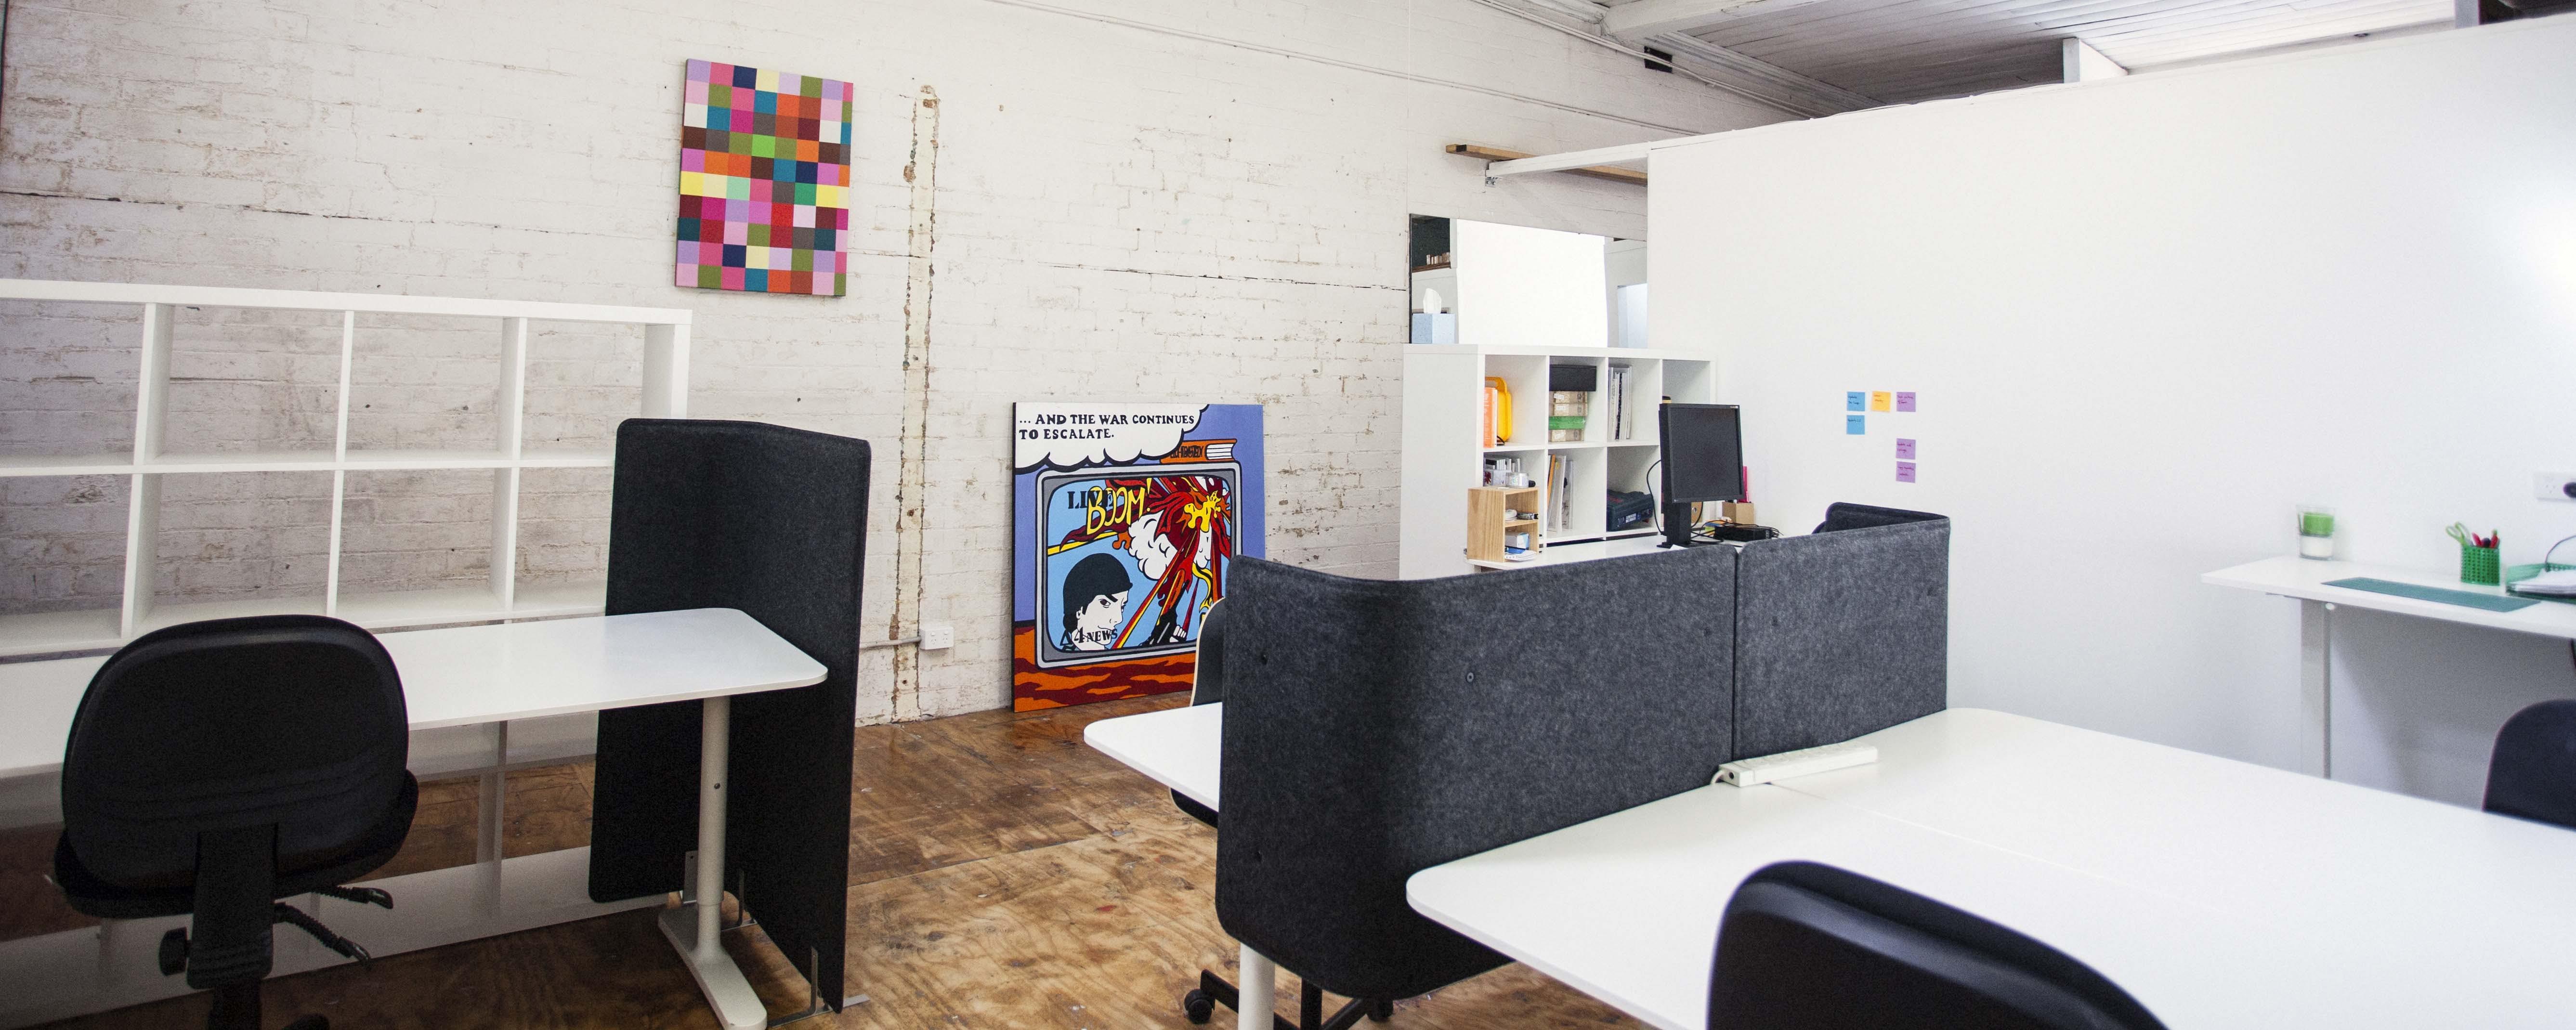 Dedicated desk at Desk and Studio, image 1